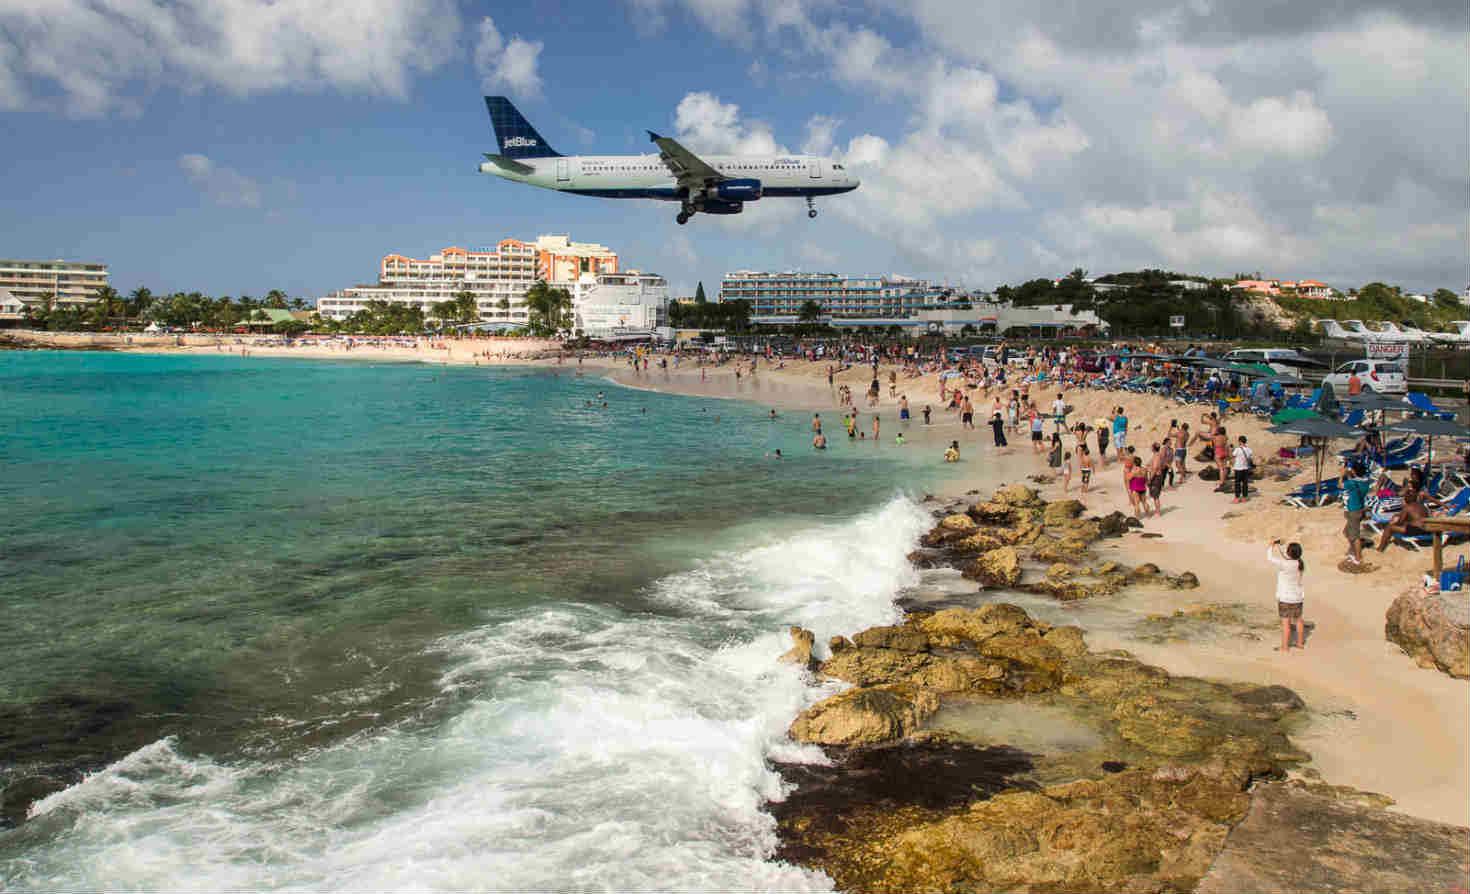 JetBlue plane landing in St. Maarten